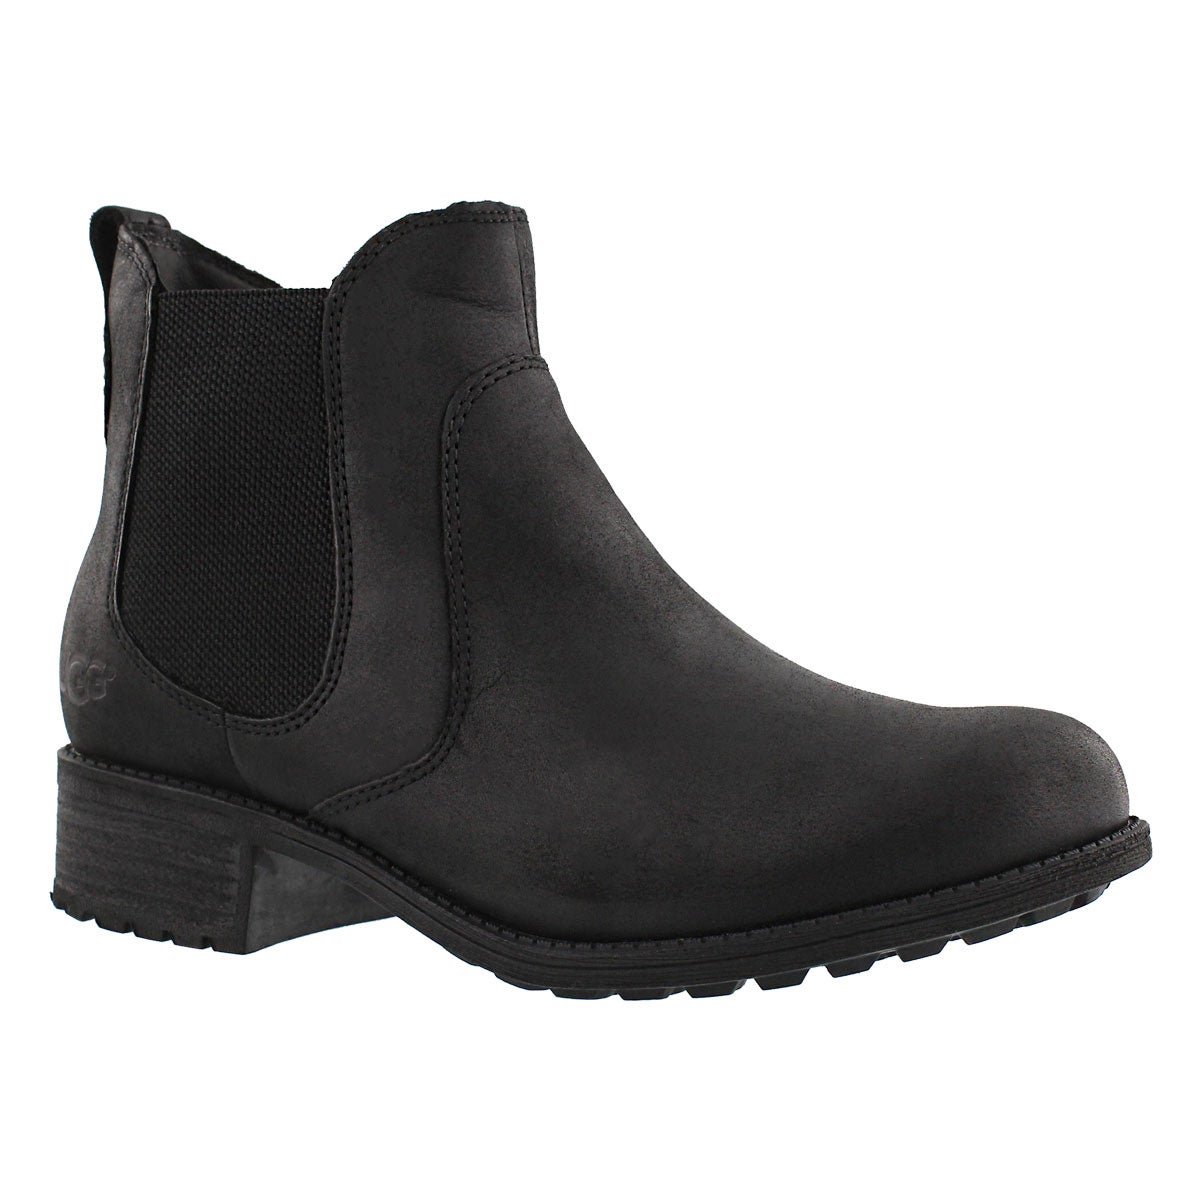 Women's BONHAM black chelsea boots